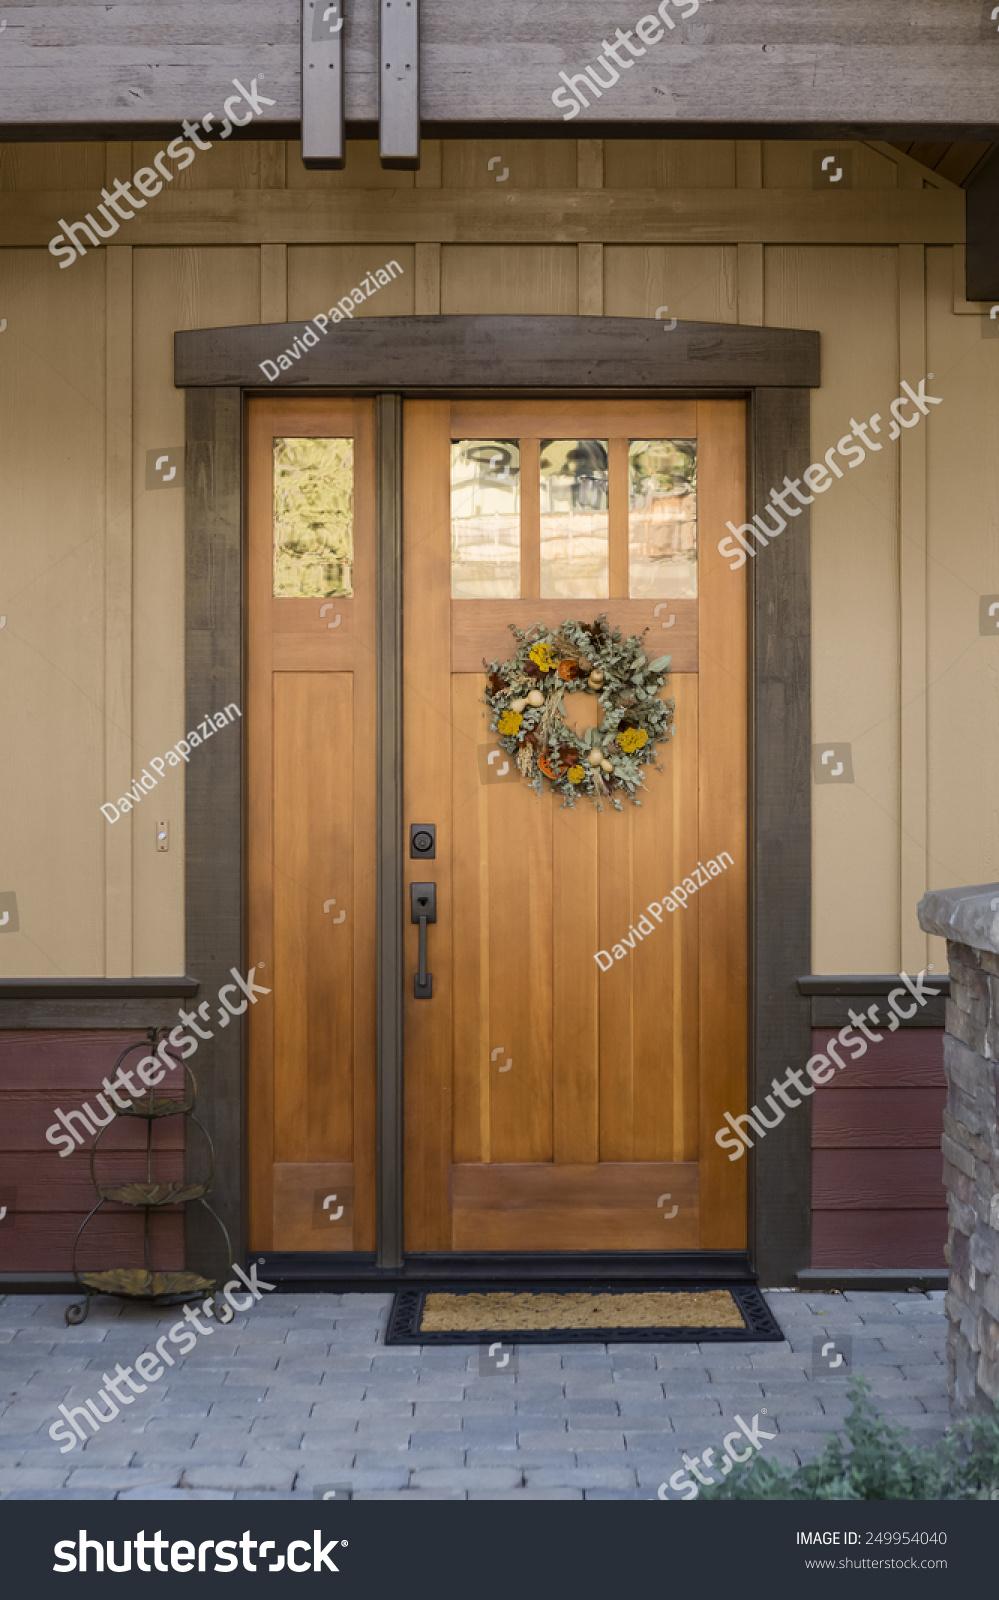 Warm Entryway With Natural Wood Front Door, Hanging Wreath, Doormat And  Decorative Piece On